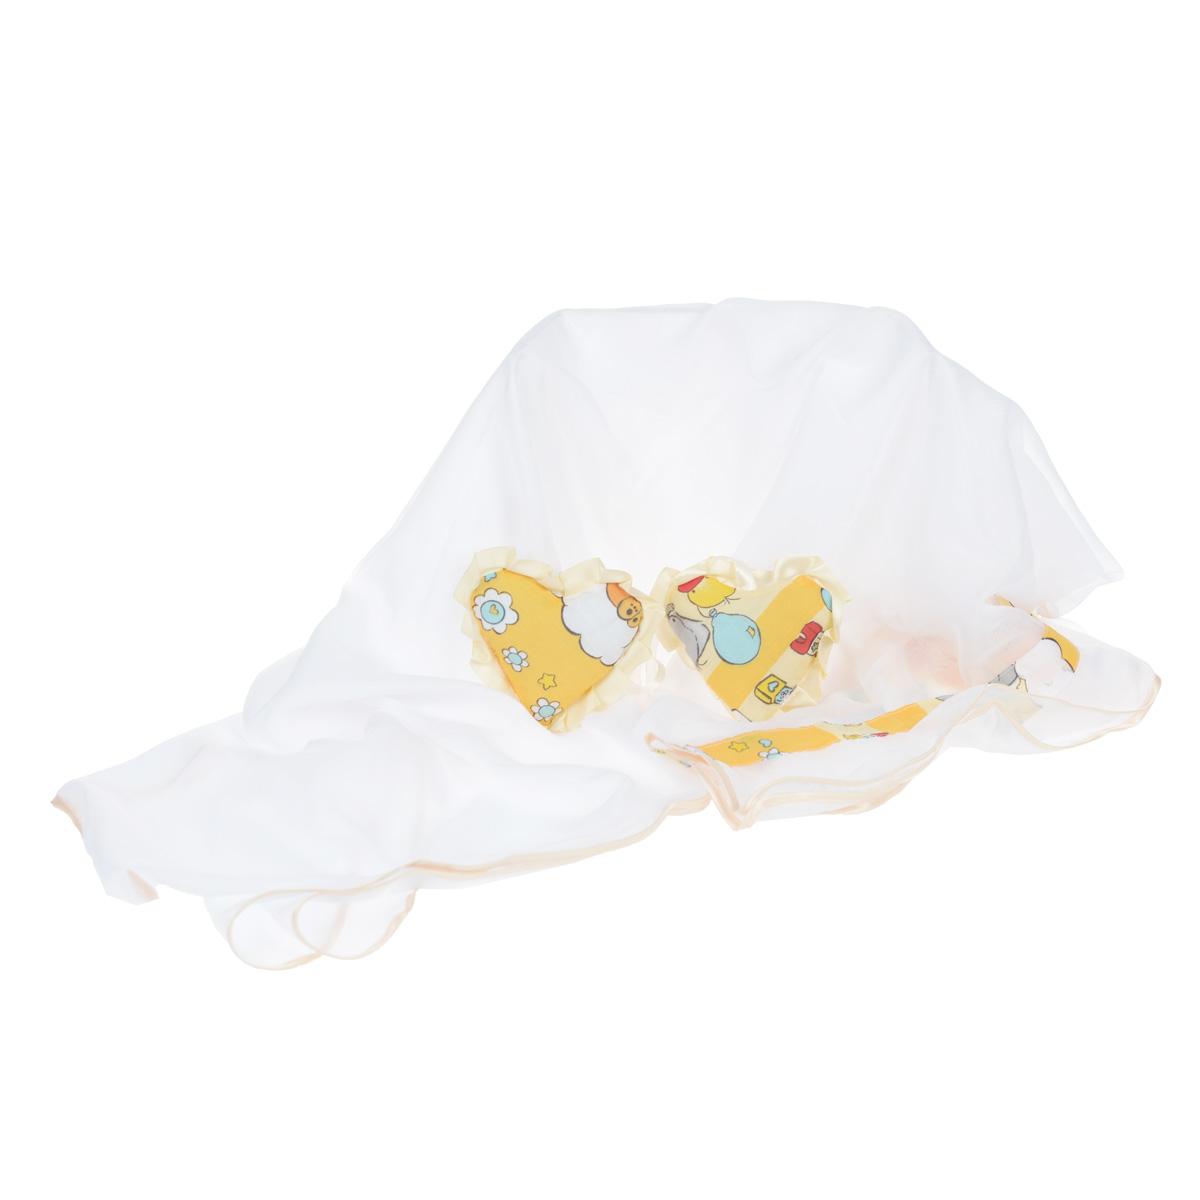 Балдахин  Фея , цвет: бежевый, желтый, 250 см х 150 см -  Бортики, бамперы